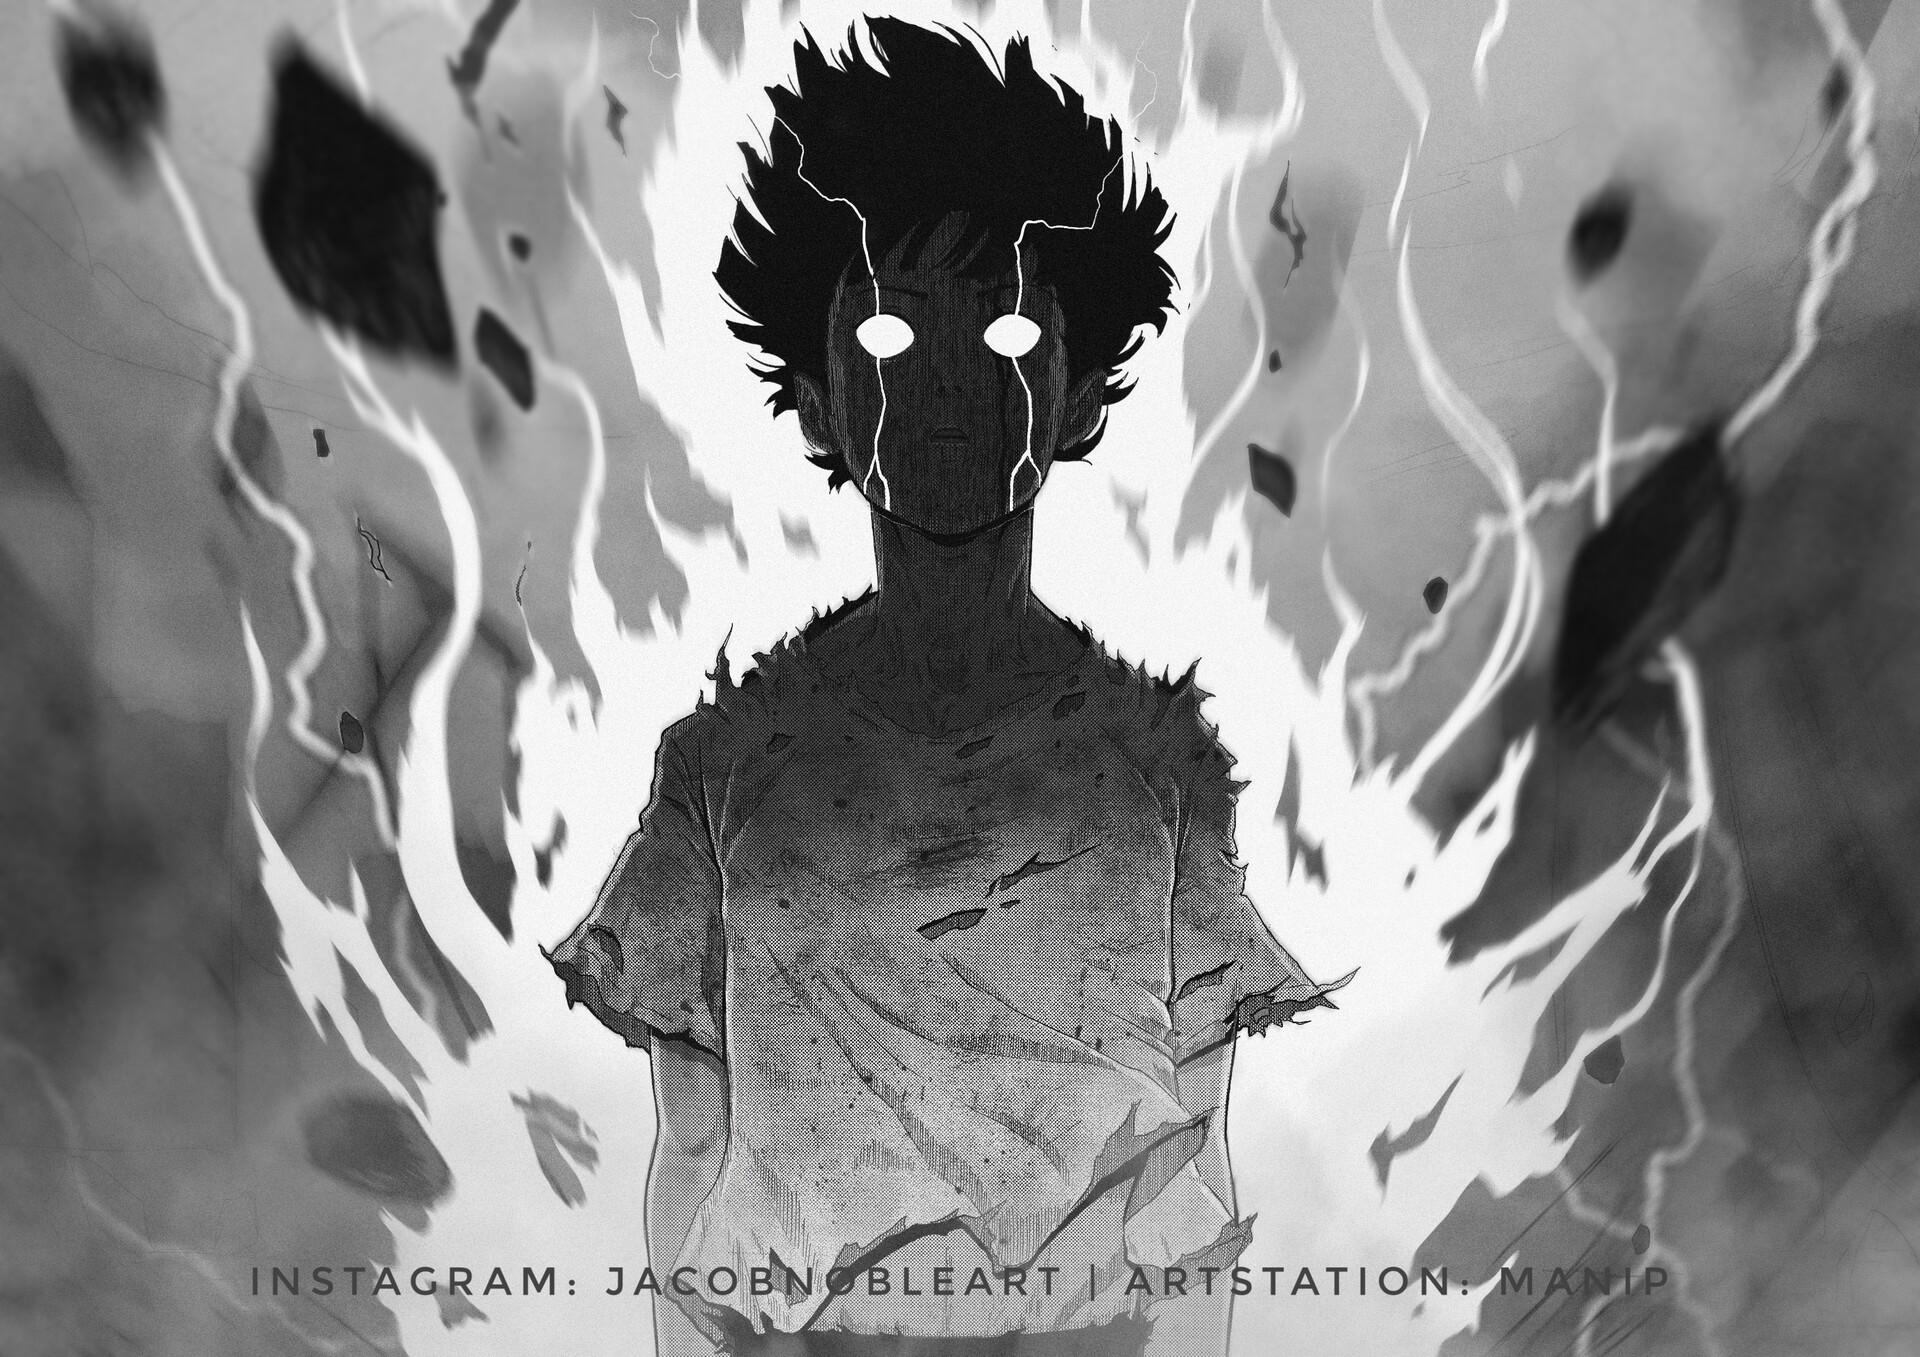 ArtStation - Mob Psycho, Jacob Noble